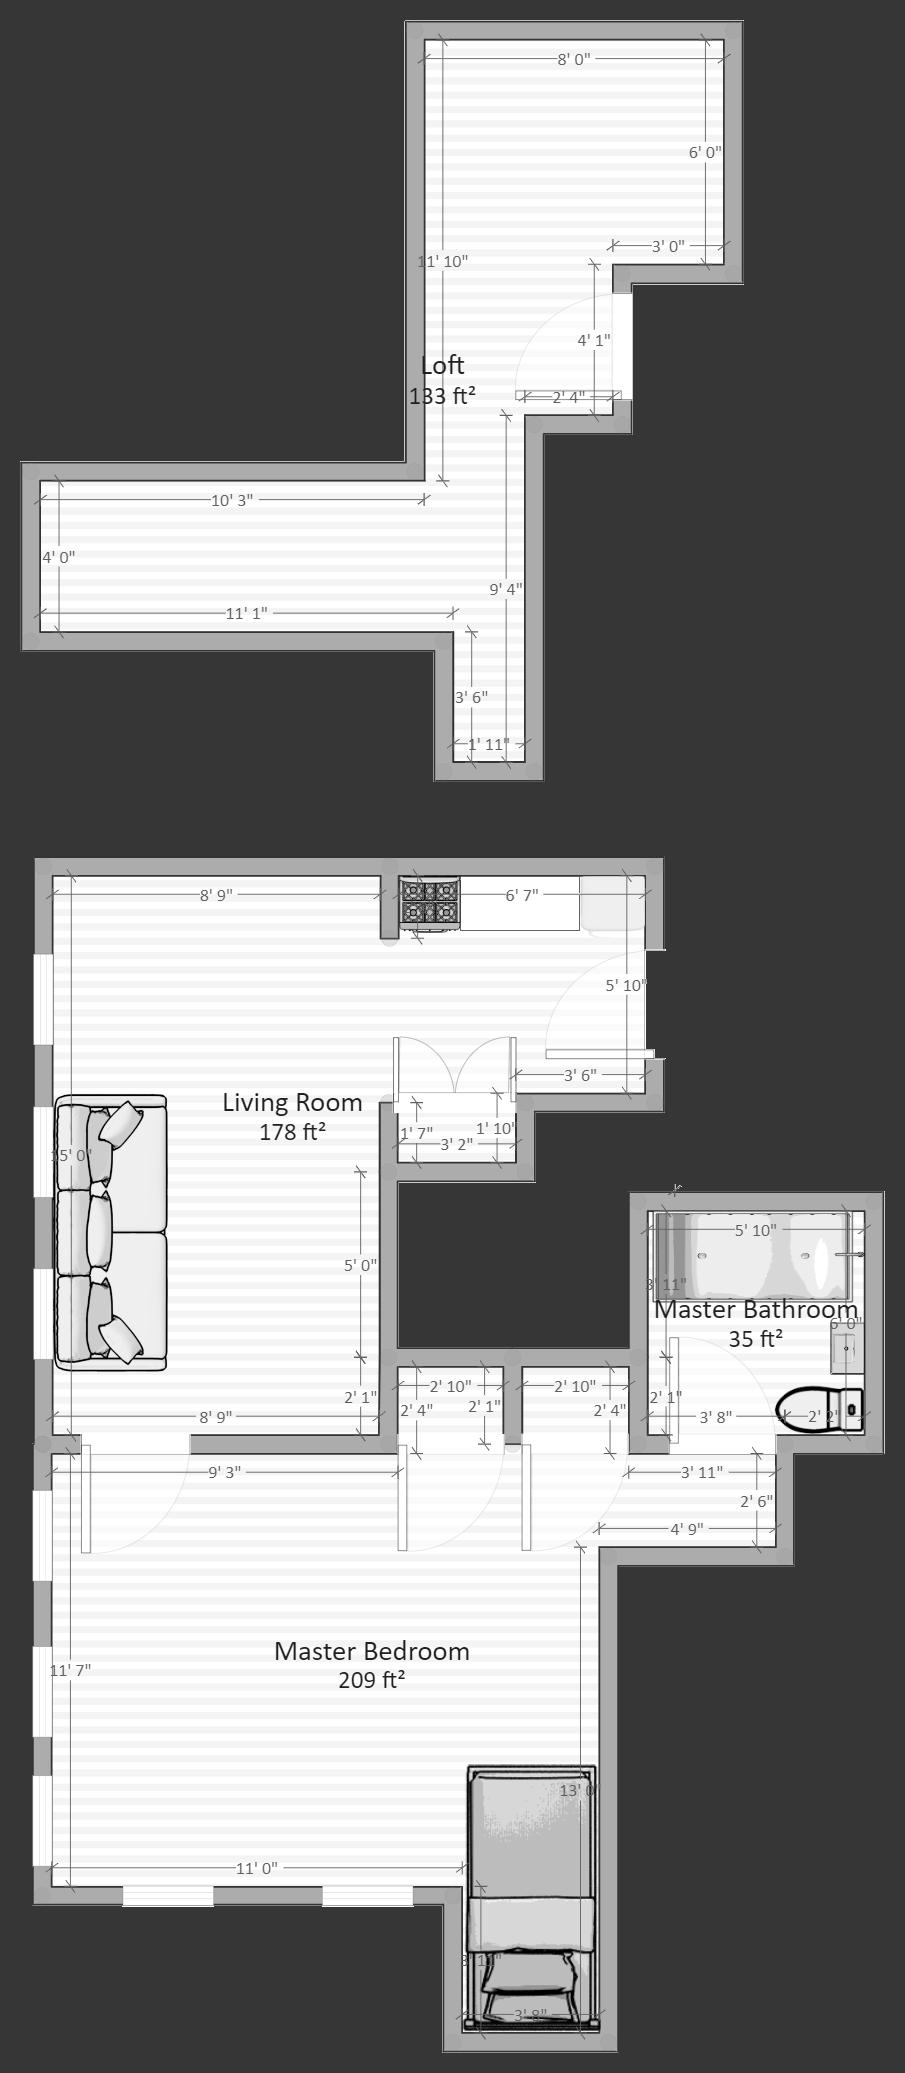 Kitchenette Apartment with Loft